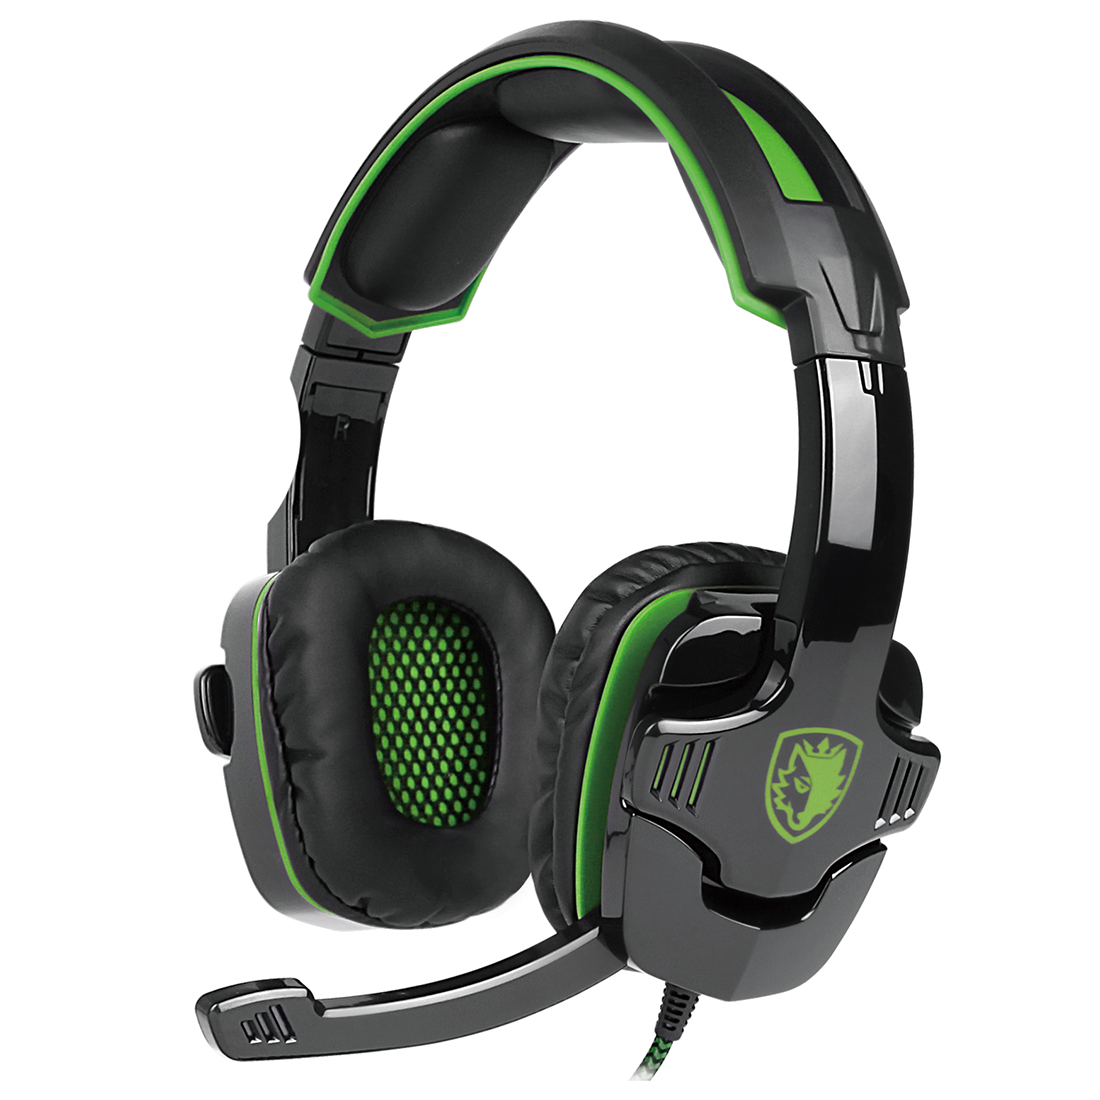 SA-930 Stereo Surround Gaming Headset Headband Mic Headphone